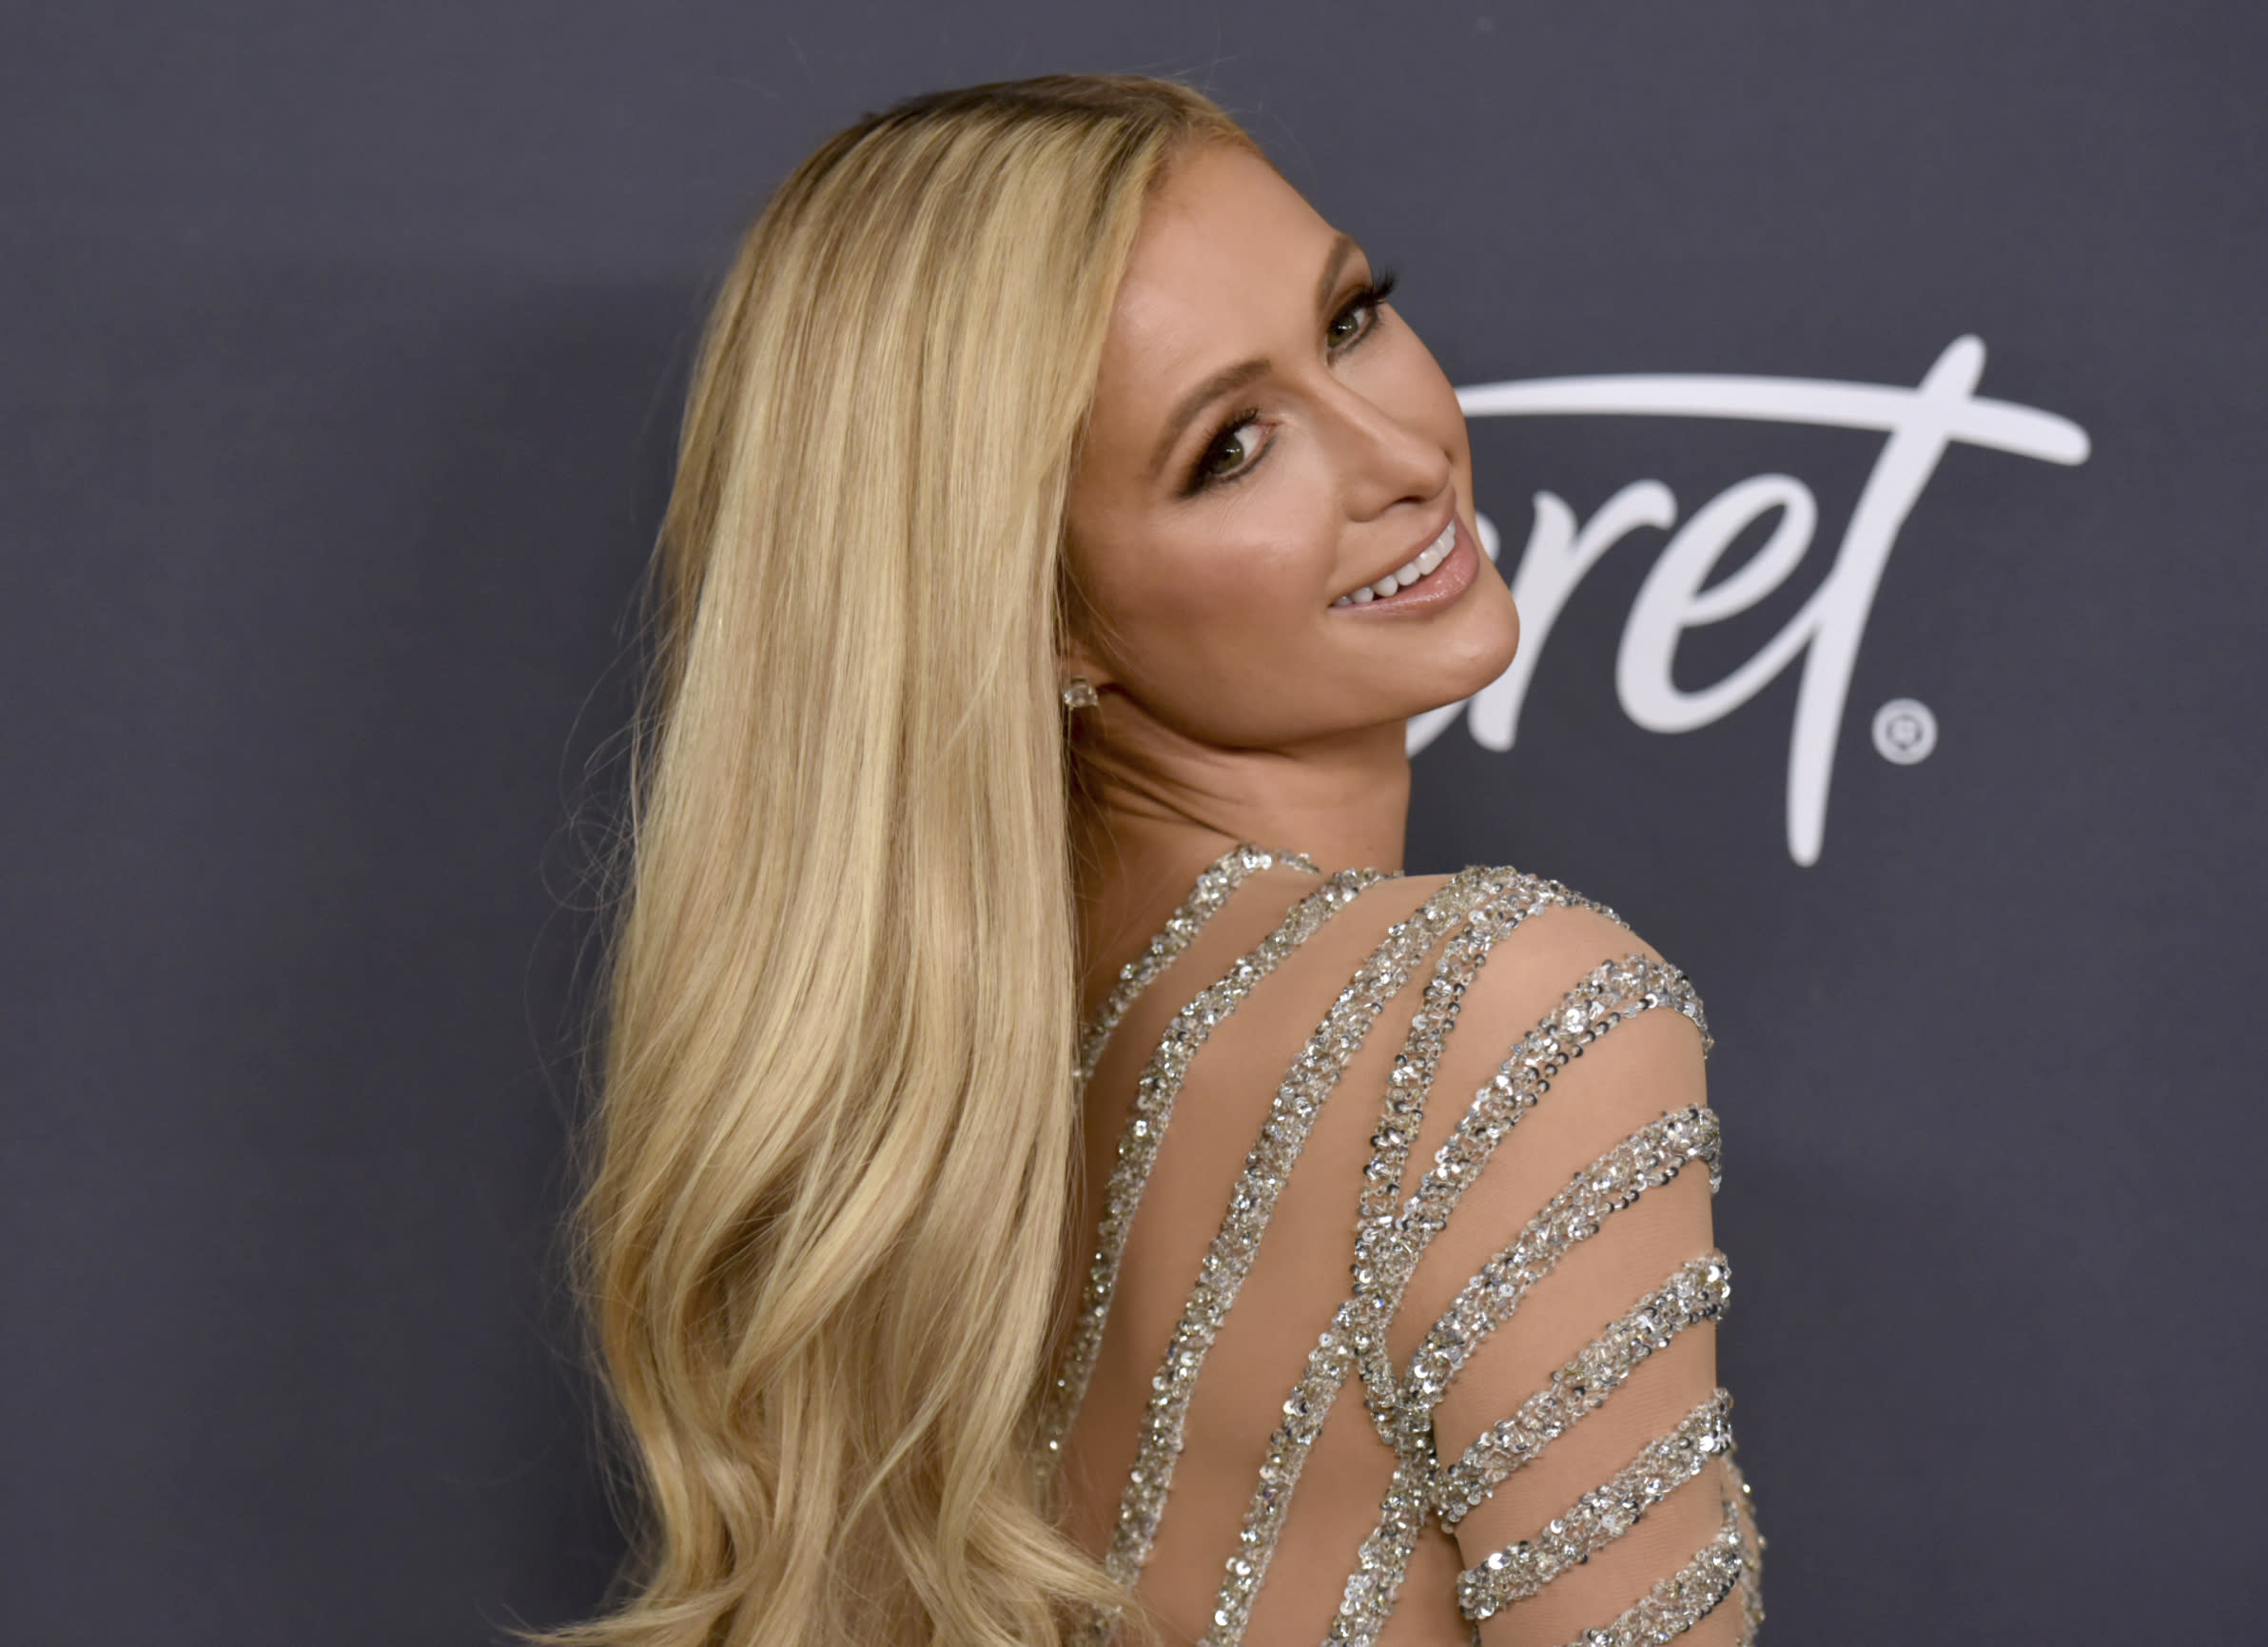 Paris Hilton makes comeback in hilarious online cooking video making lasagne